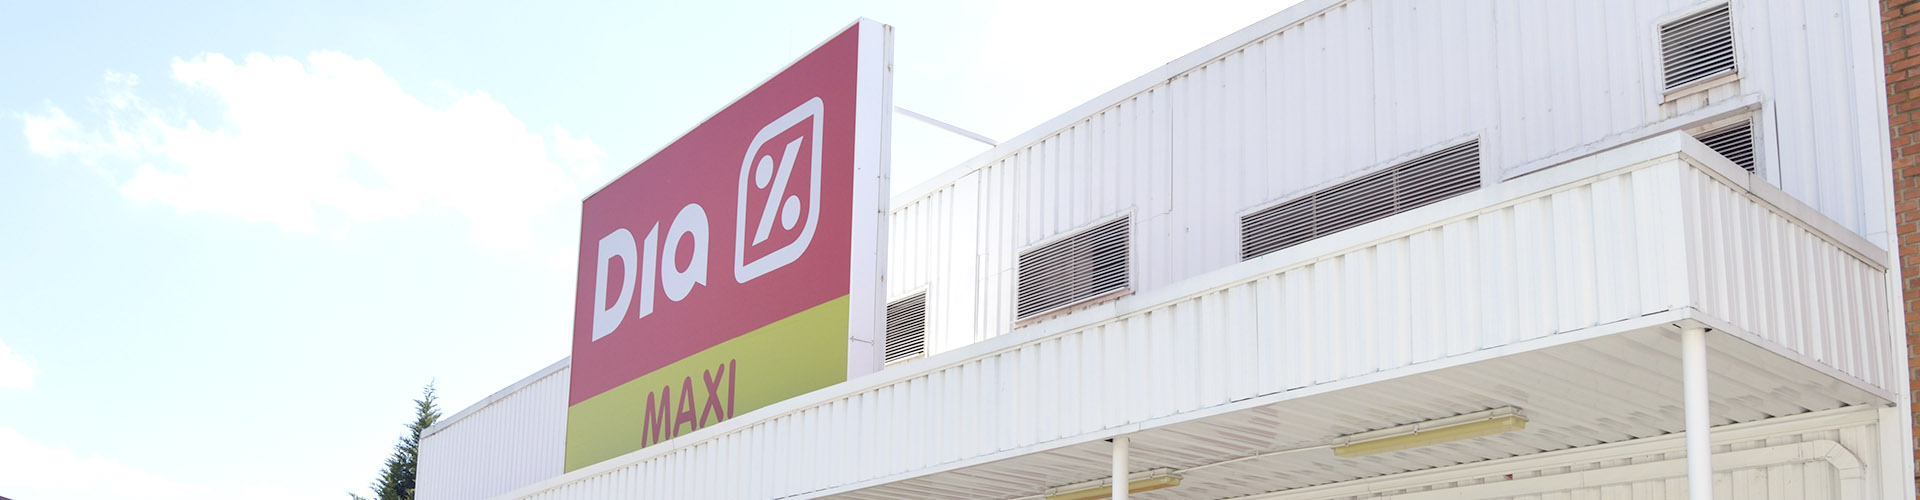 renovacion-fachada-cambio-imagen-corporativa-supermercado-DIA-Slider